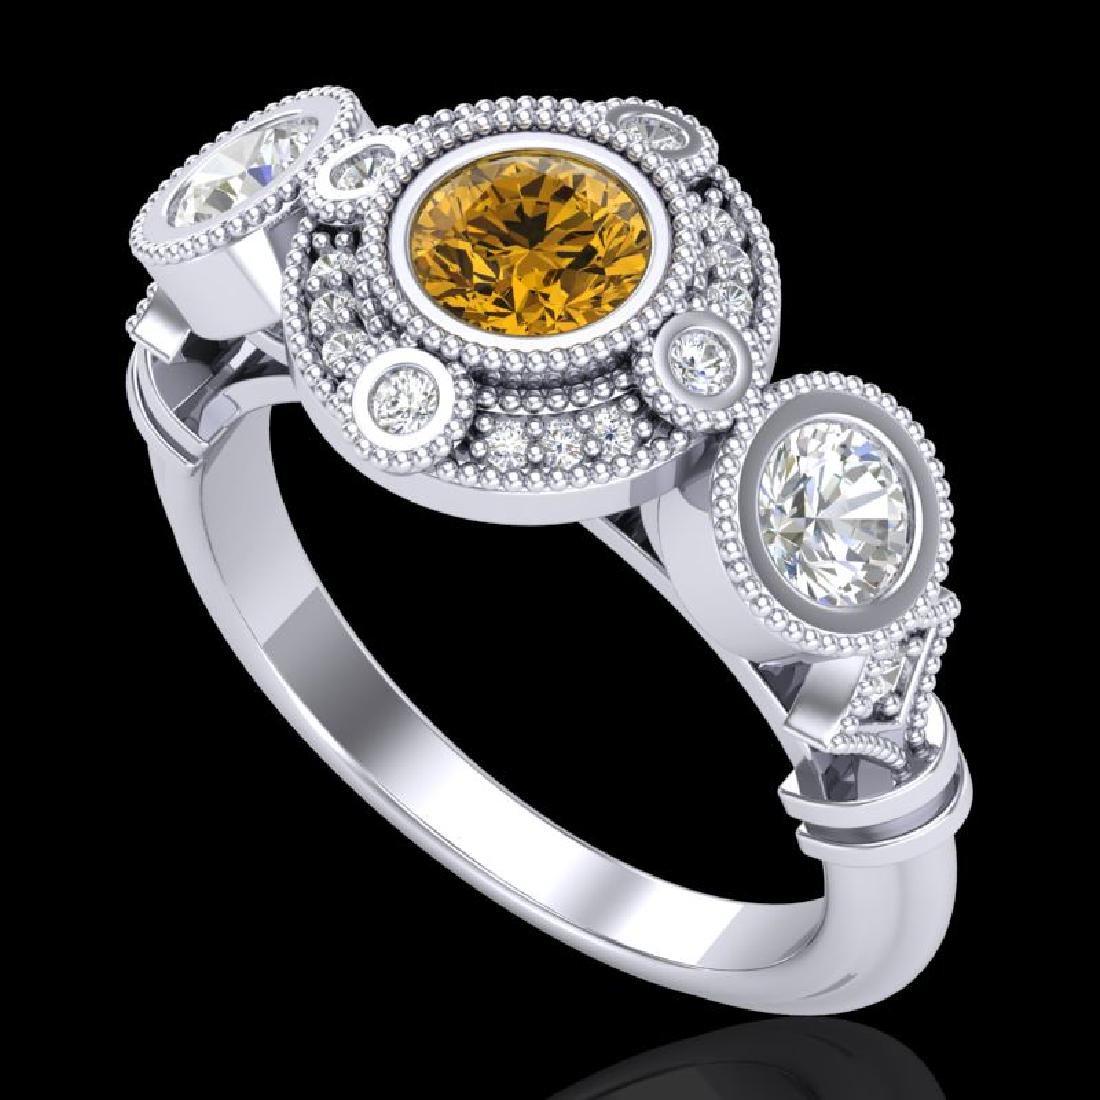 1.51 CTW Intense Fancy Yellow Diamond Art Deco 3 Stone